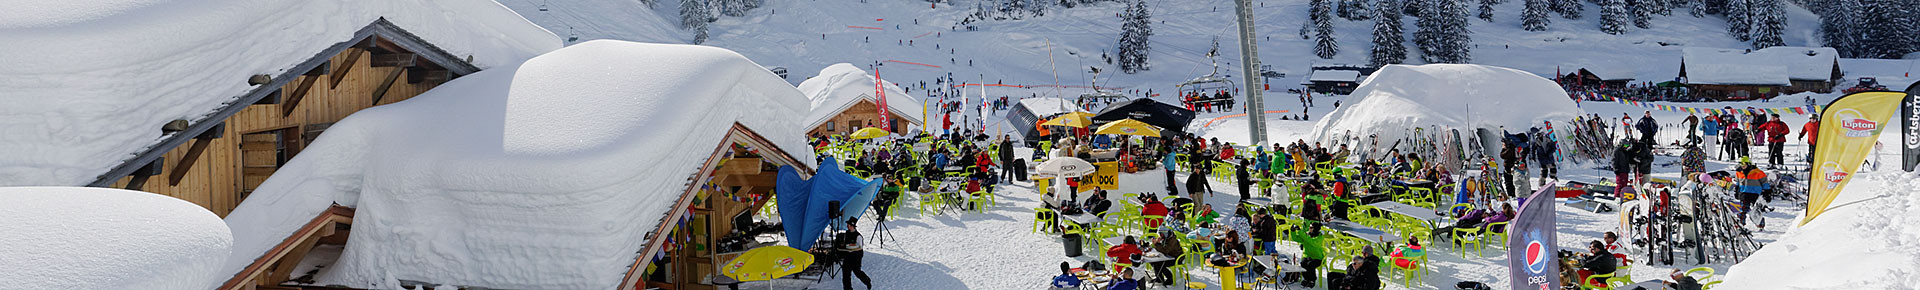 Restaurants d'altitude Lindarets